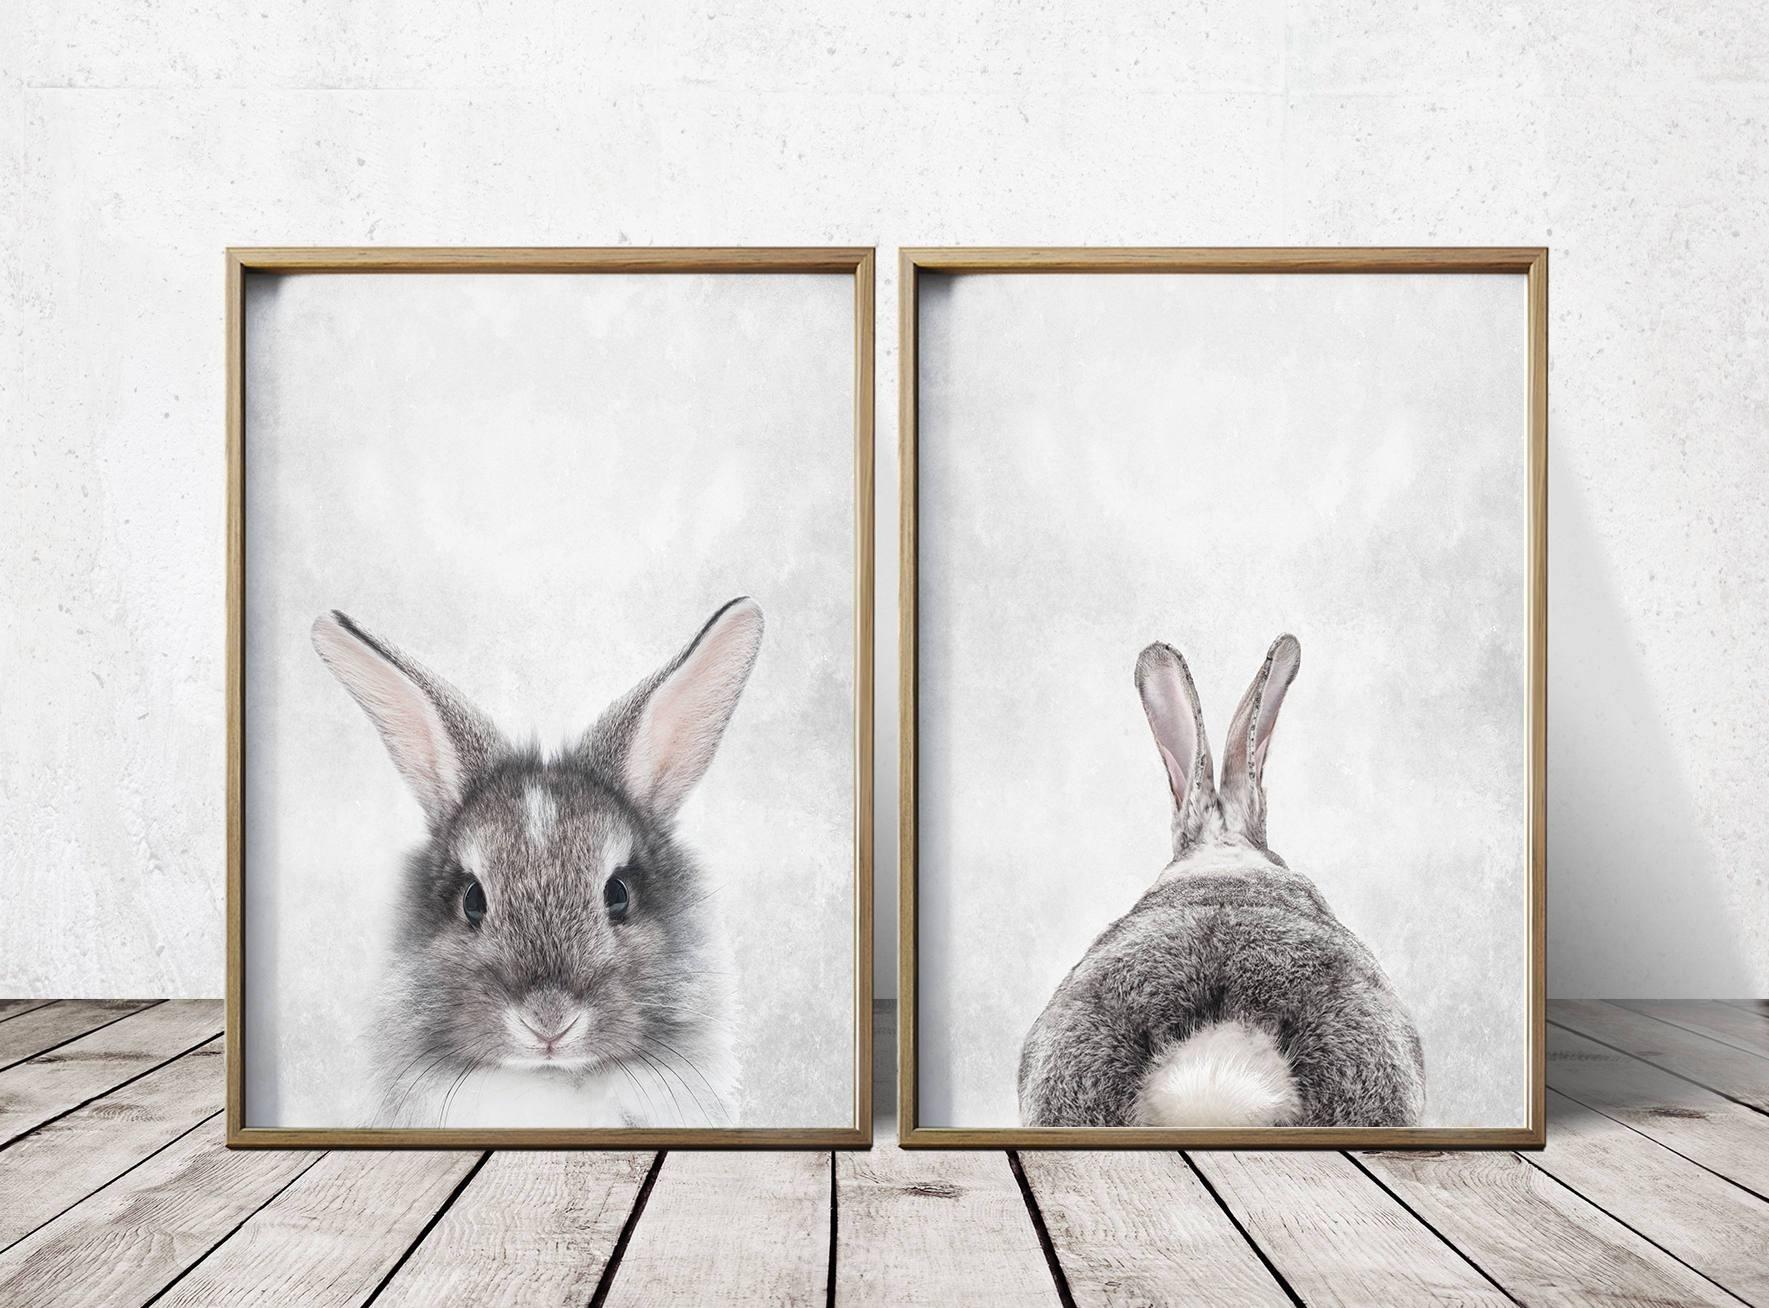 Nursery Wall Art Nursery Decor Gray Rabbit Print Bunny, Vintage Pertaining To 2017 Bunny Wall Art (Gallery 4 of 20)